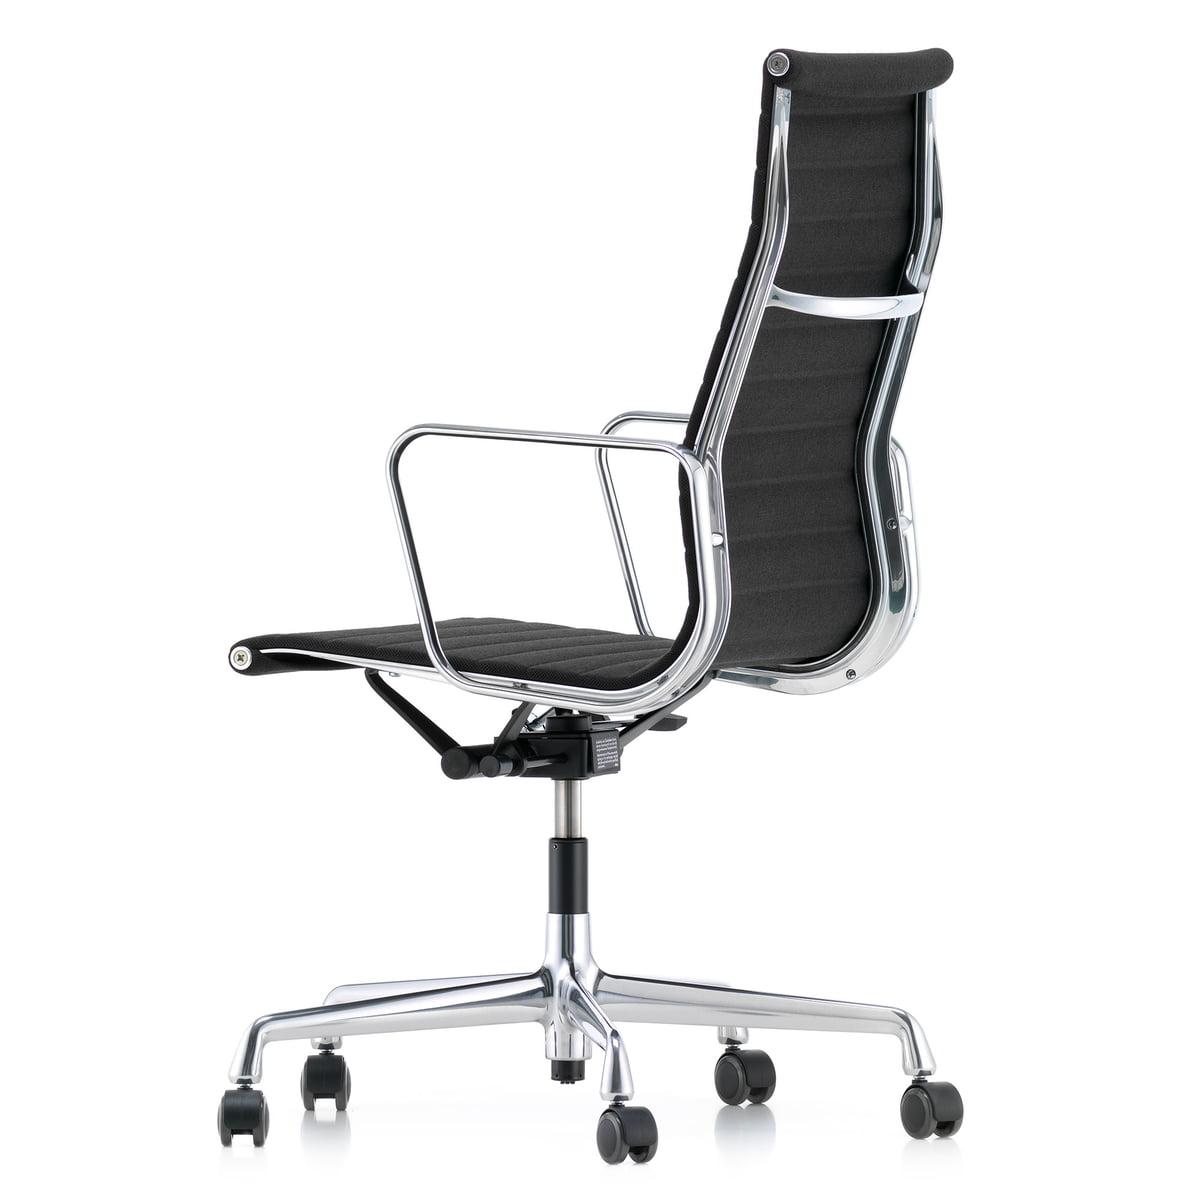 moins cher f249a f62b1 Vitra - Alu-Chair EA 119 chrome, pivotant, accoudoirs, Hopsak, noir